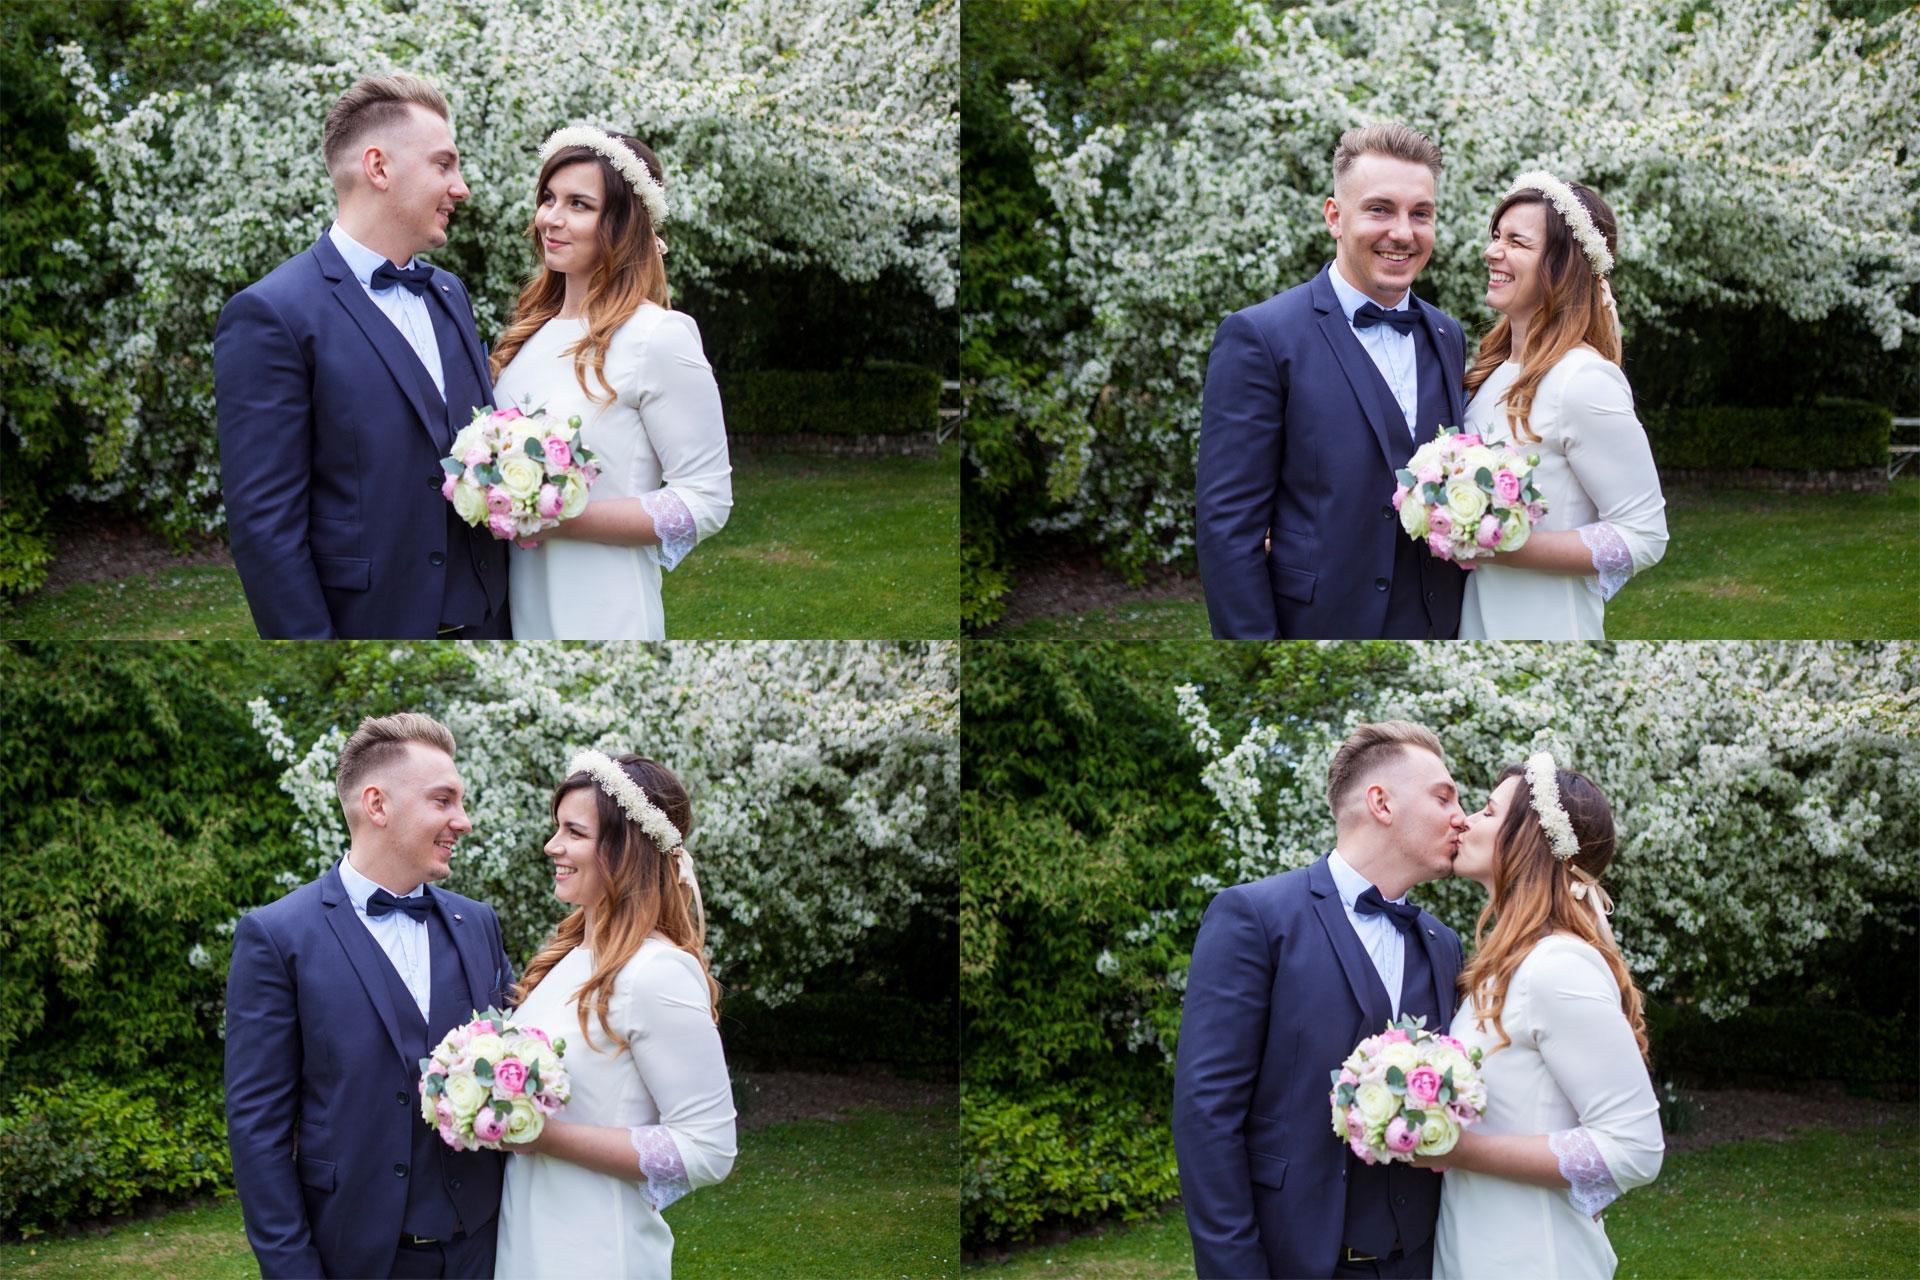 particuliers-evenements-mariages-oui-zelie&valentin-14